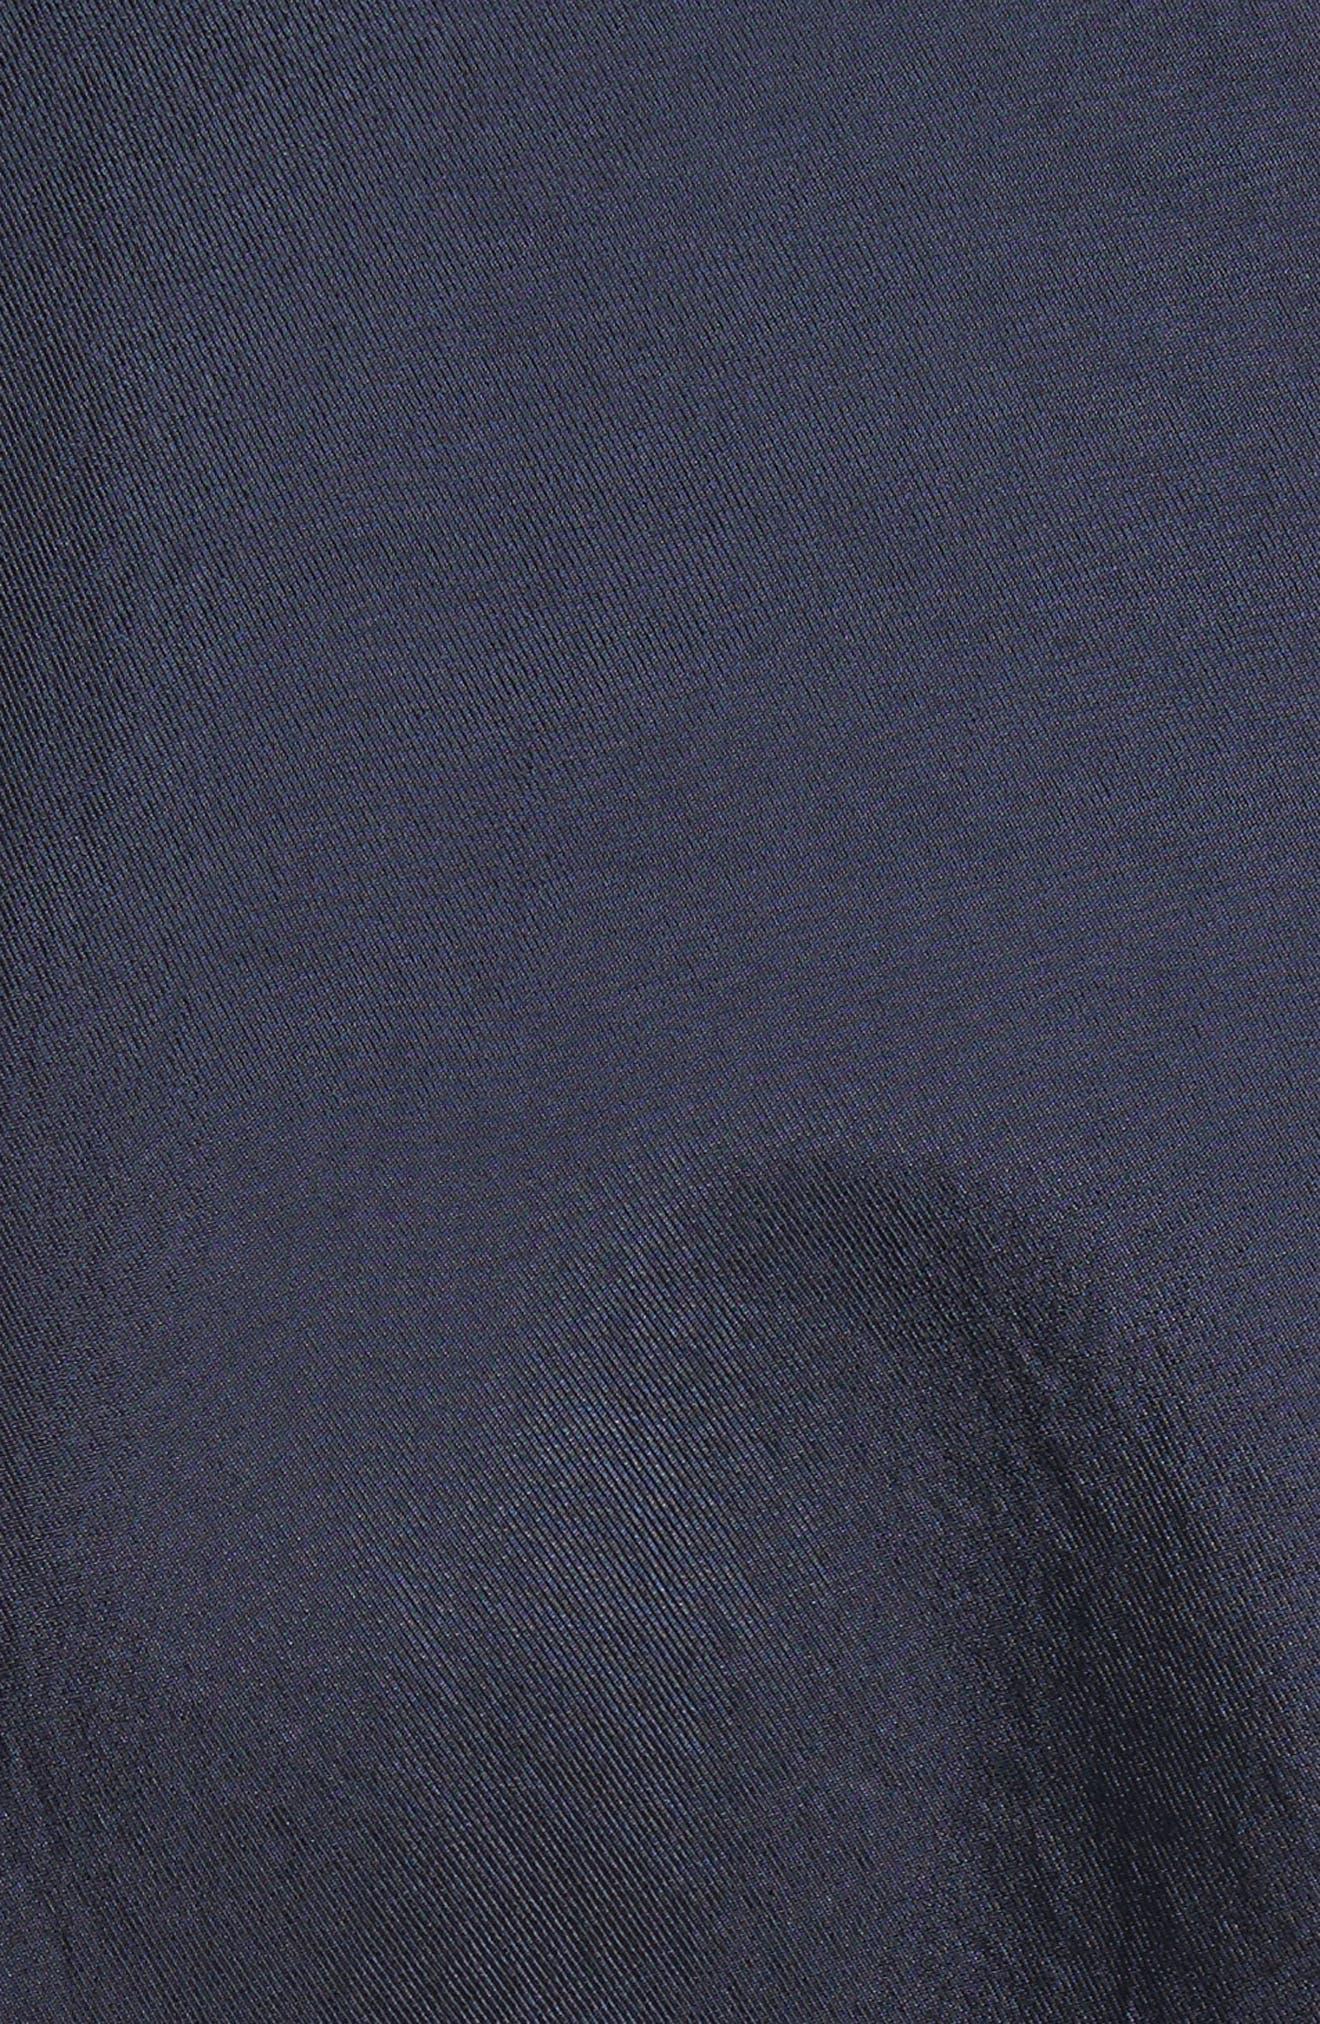 Colorblock Skirt,                             Alternate thumbnail 5, color,                             404